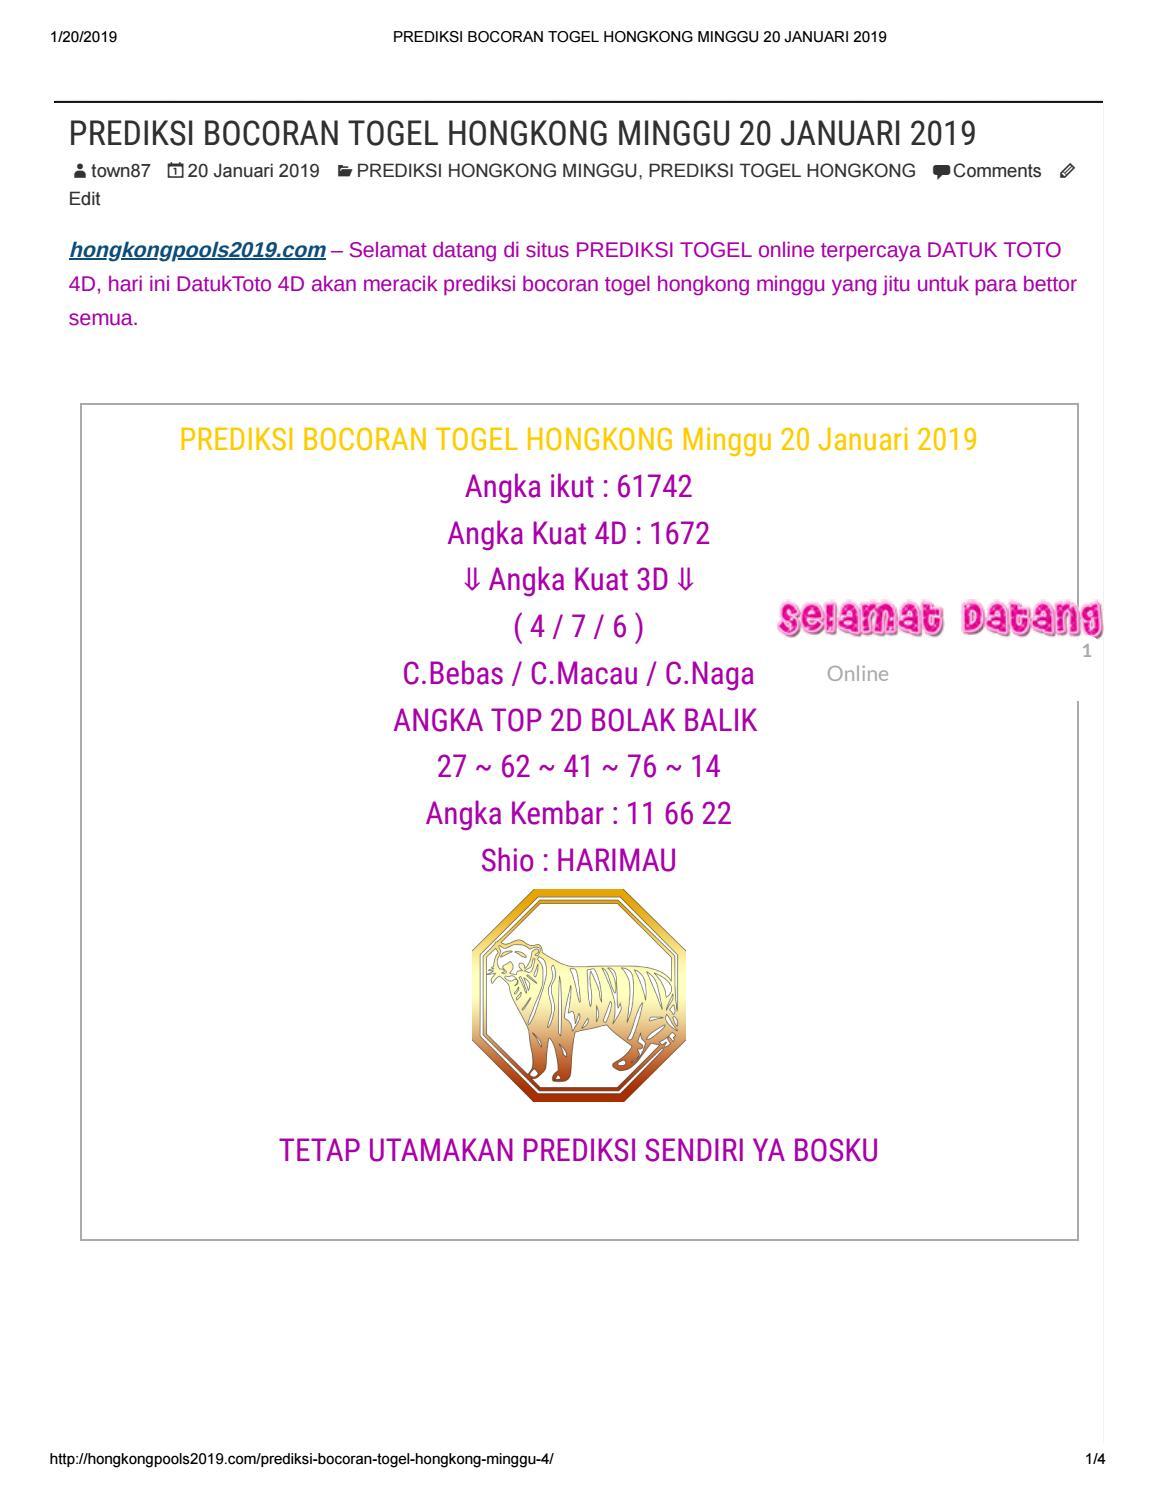 PREDIKSI BOCORAN TOGEL HONGKONG MINGGU 20 JANUARI 2019 by angelina1310 -  issuu 91046a03d2